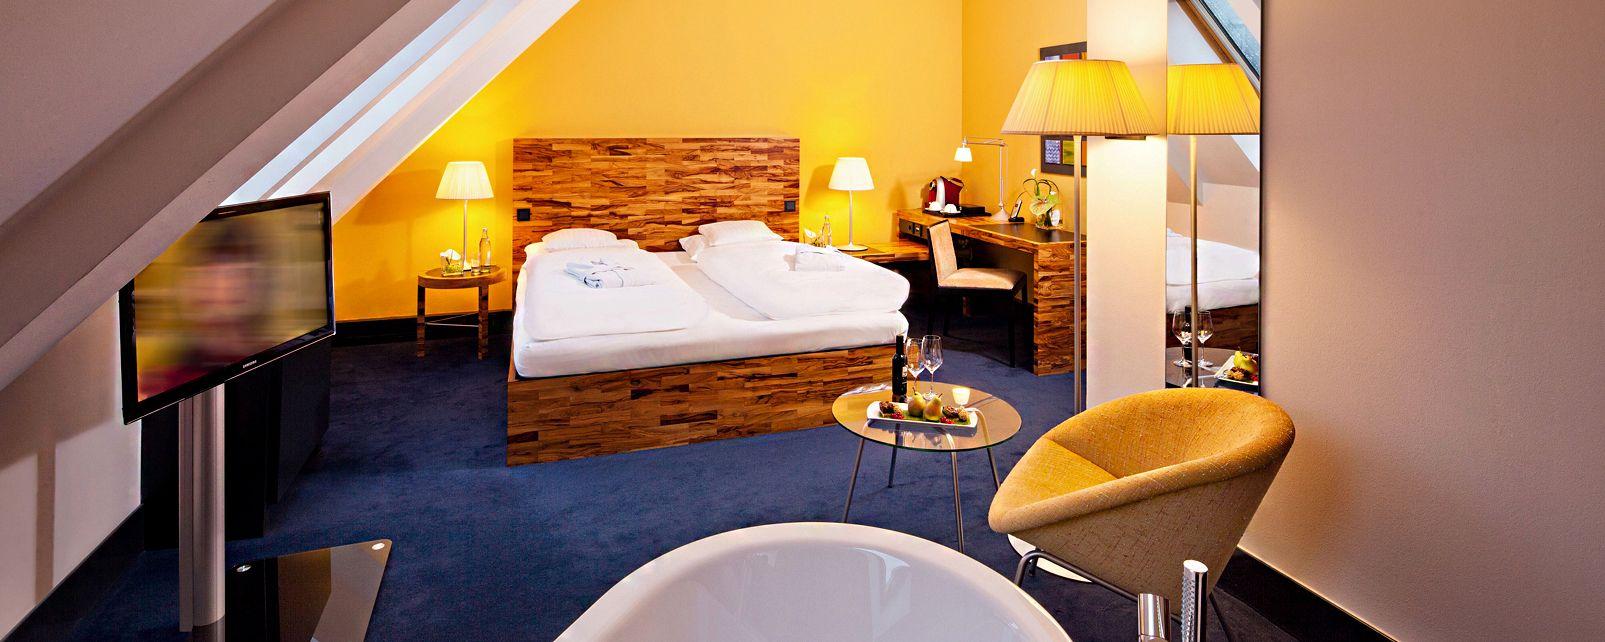 Hotel Moevenpick